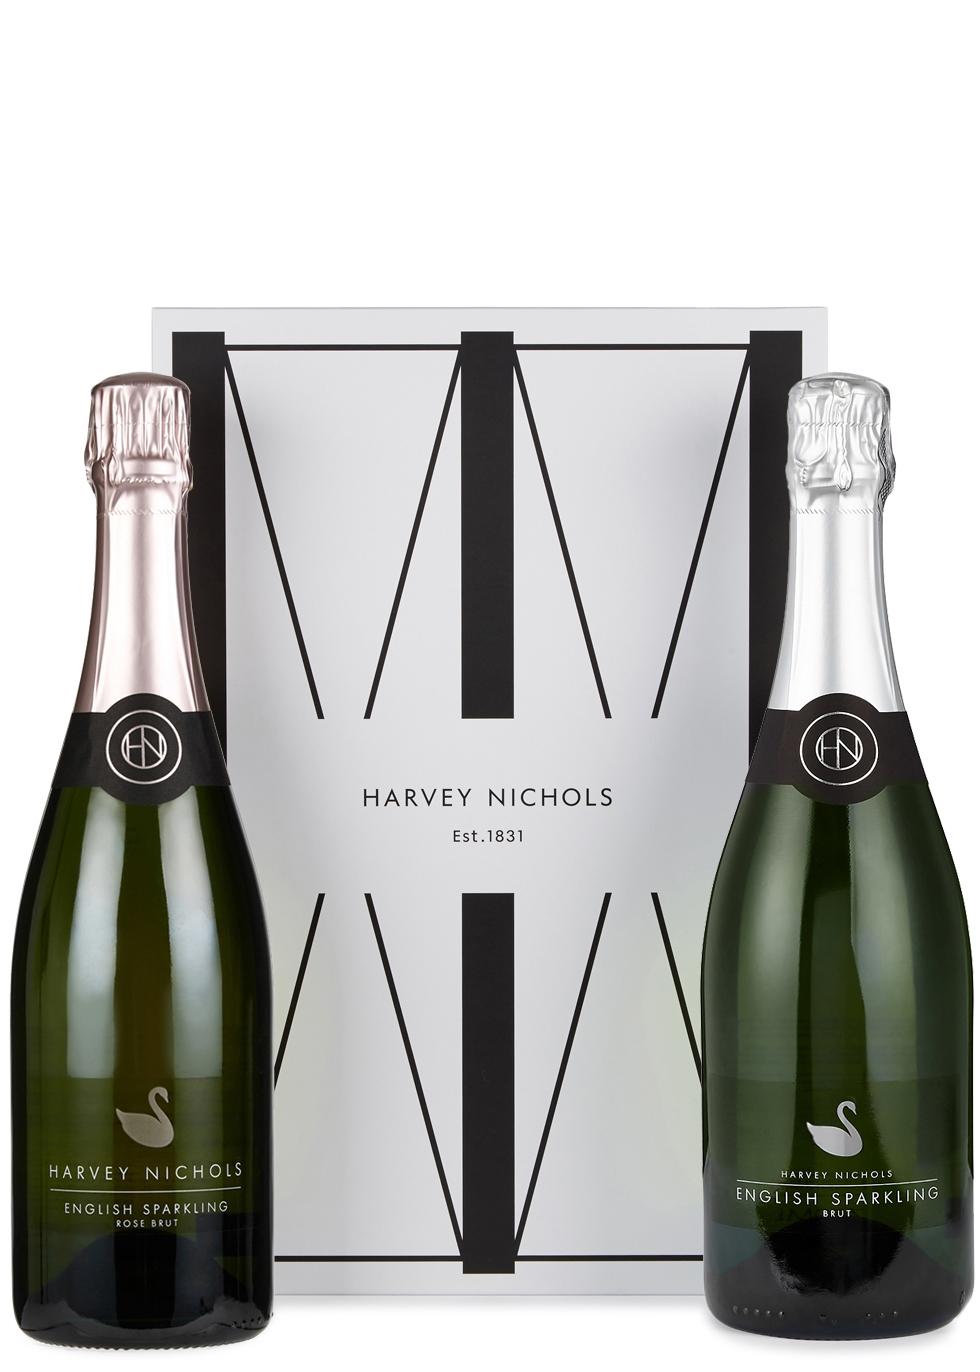 English Sparkling Wine Duo - Harvey Nichols